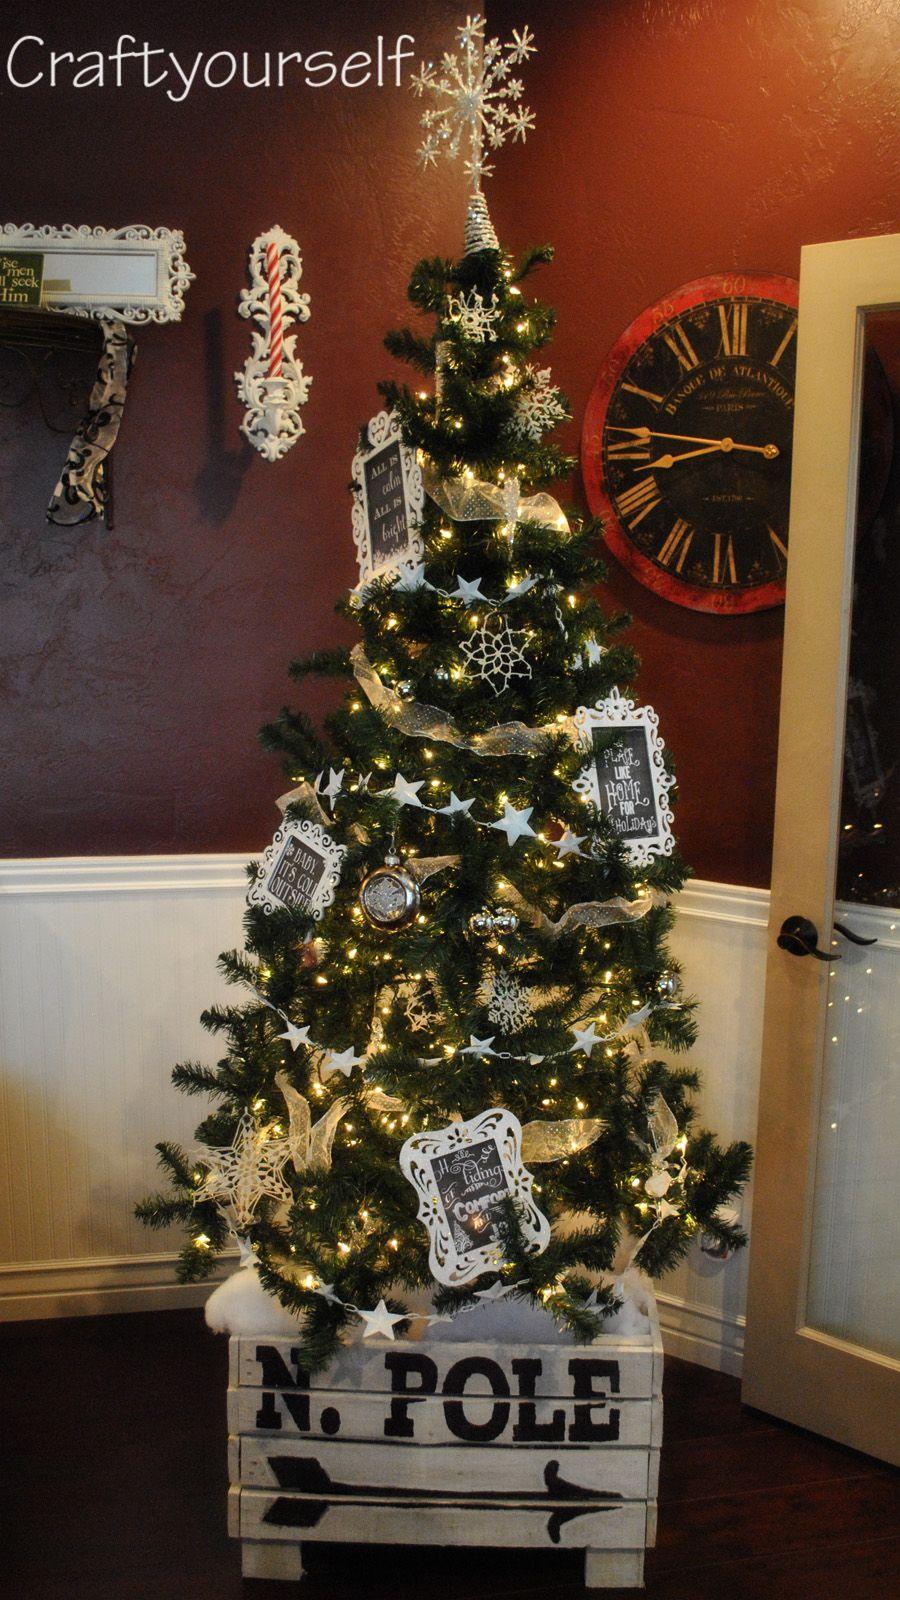 North Pole Christmas Tree Crate And Christmas Tree Make Over Craft Christmas Tree Box Christmas Tree Box Stand Christmas Tree Stand